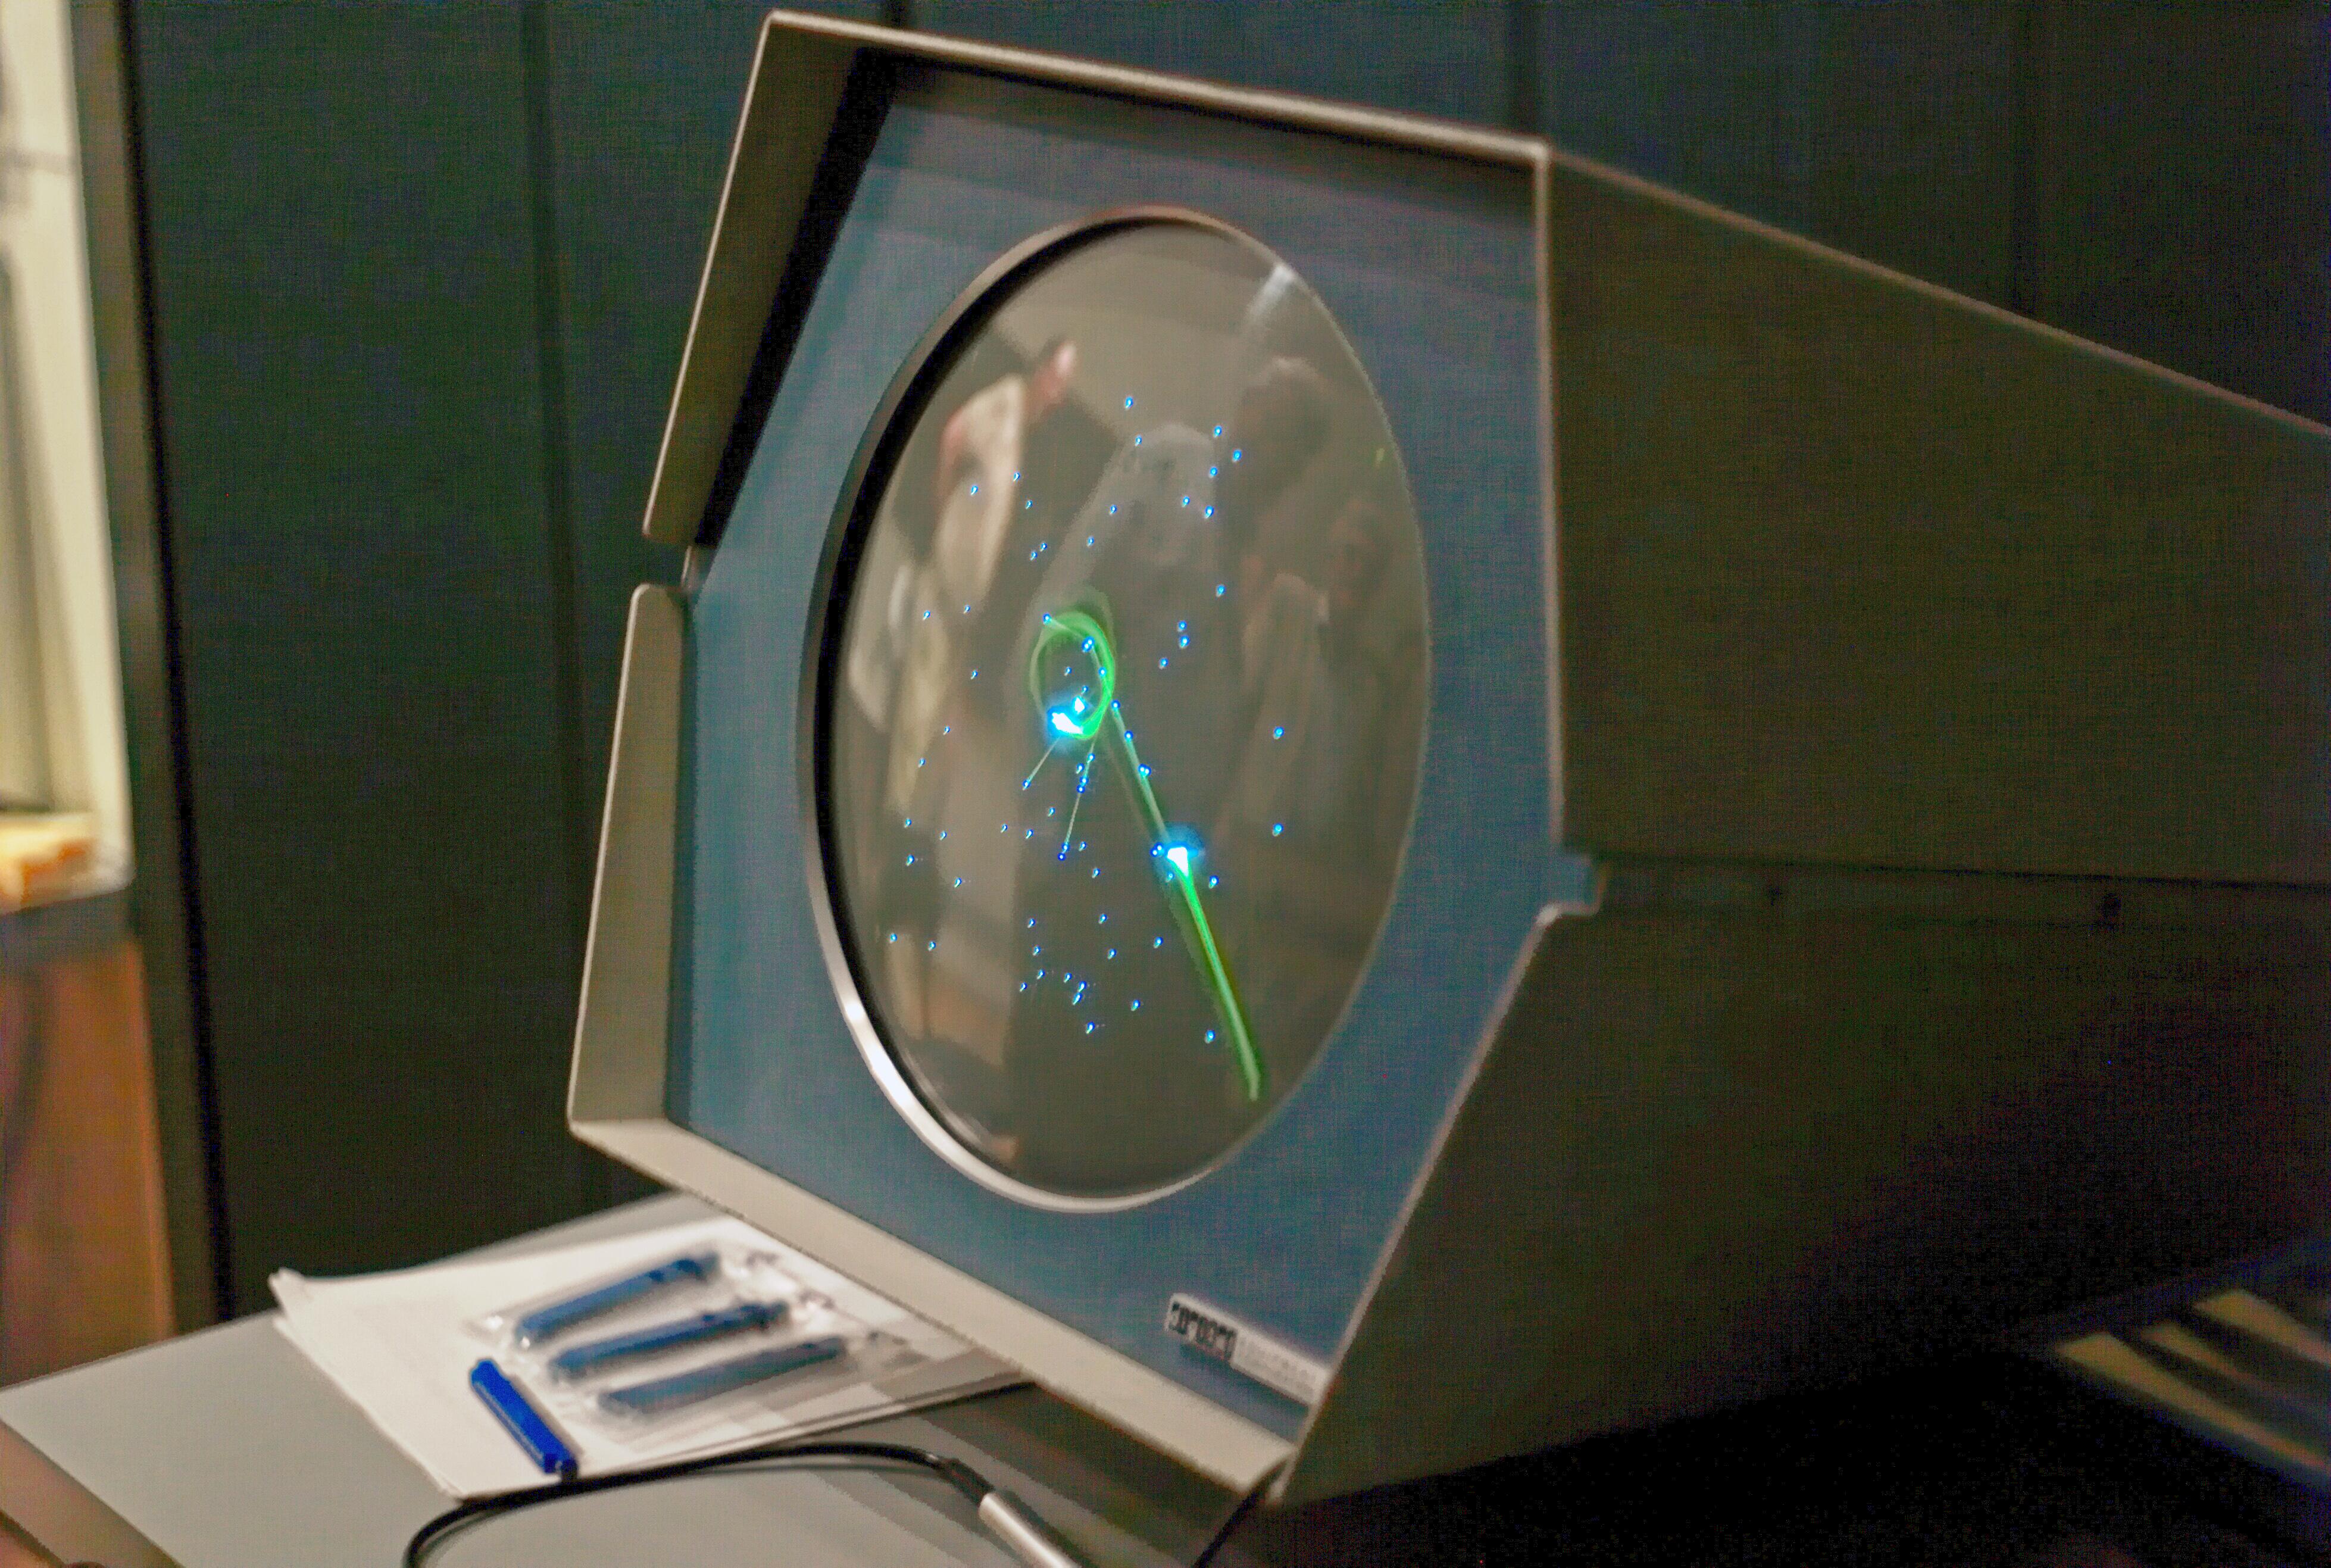 Eerste computerspel: op zo'n soort computer werd Spacewar! gespeeld